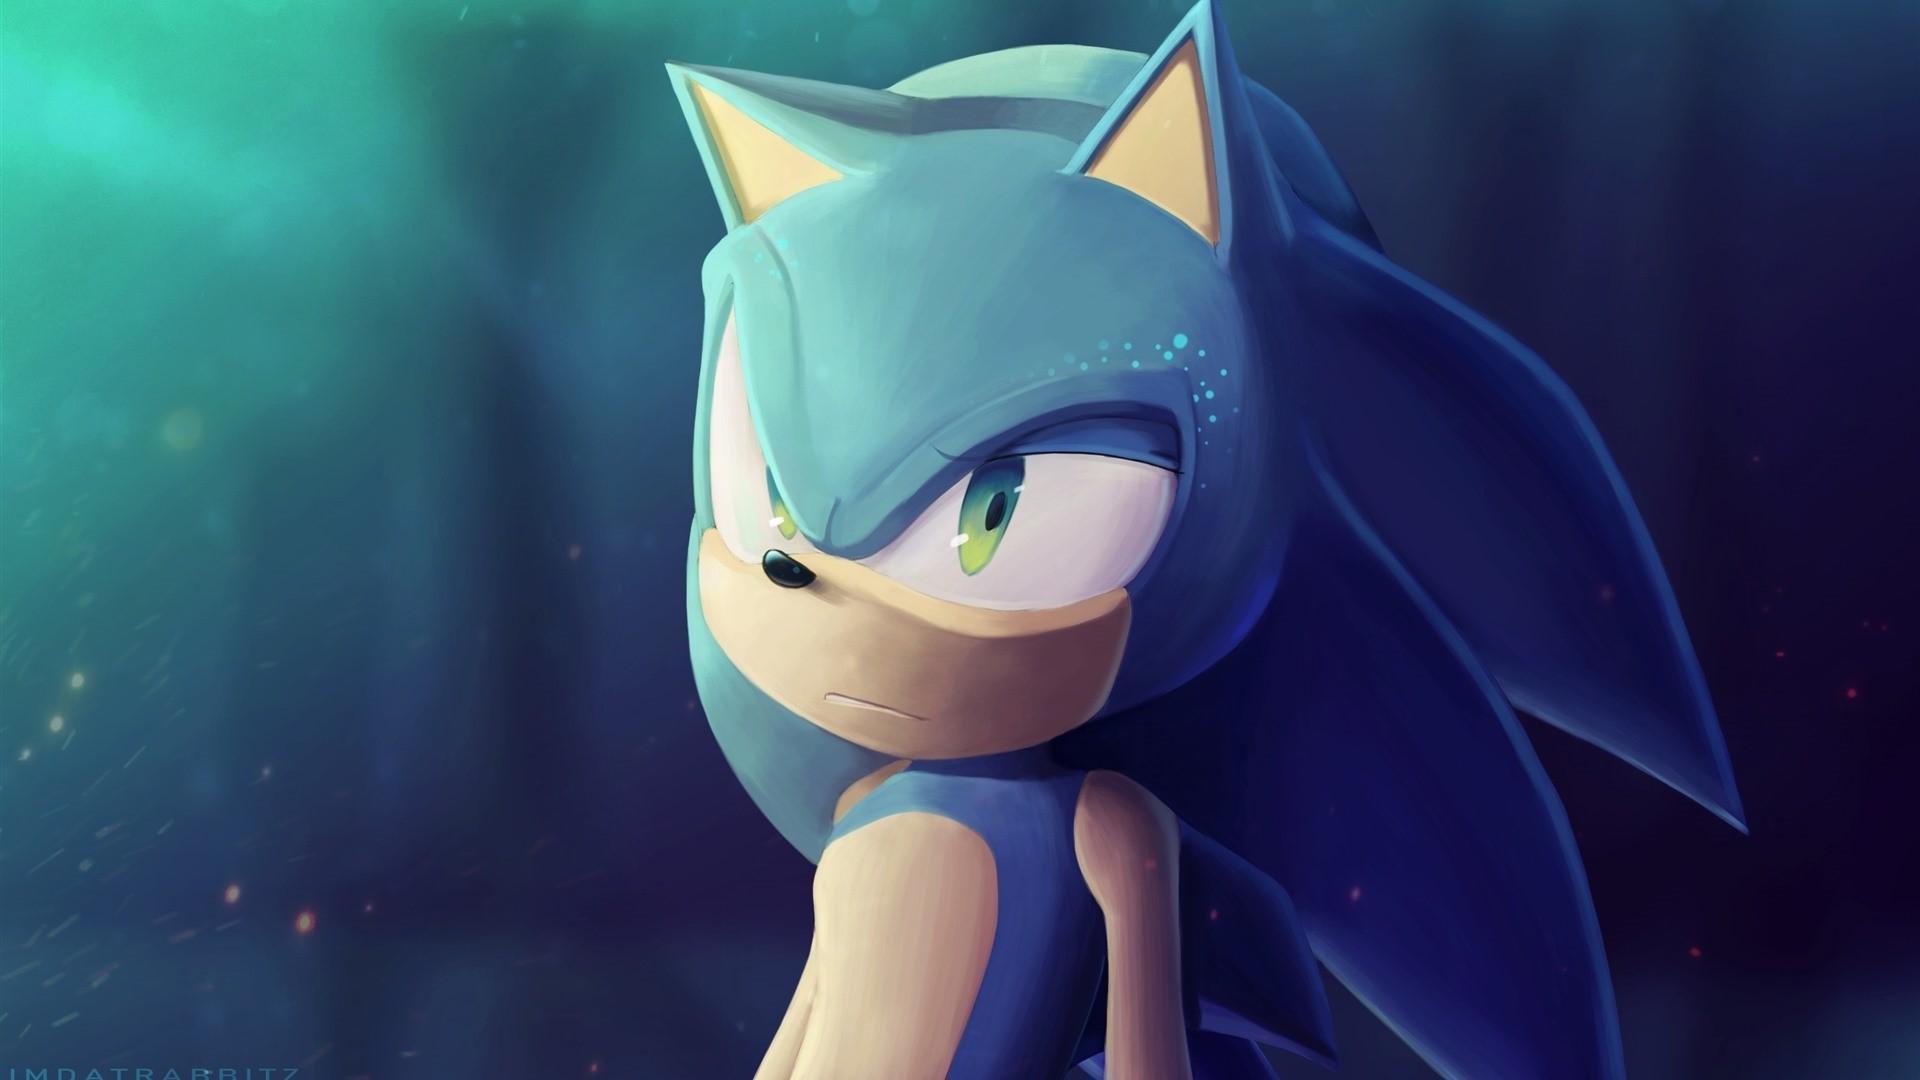 Sonic Download Wallpaper